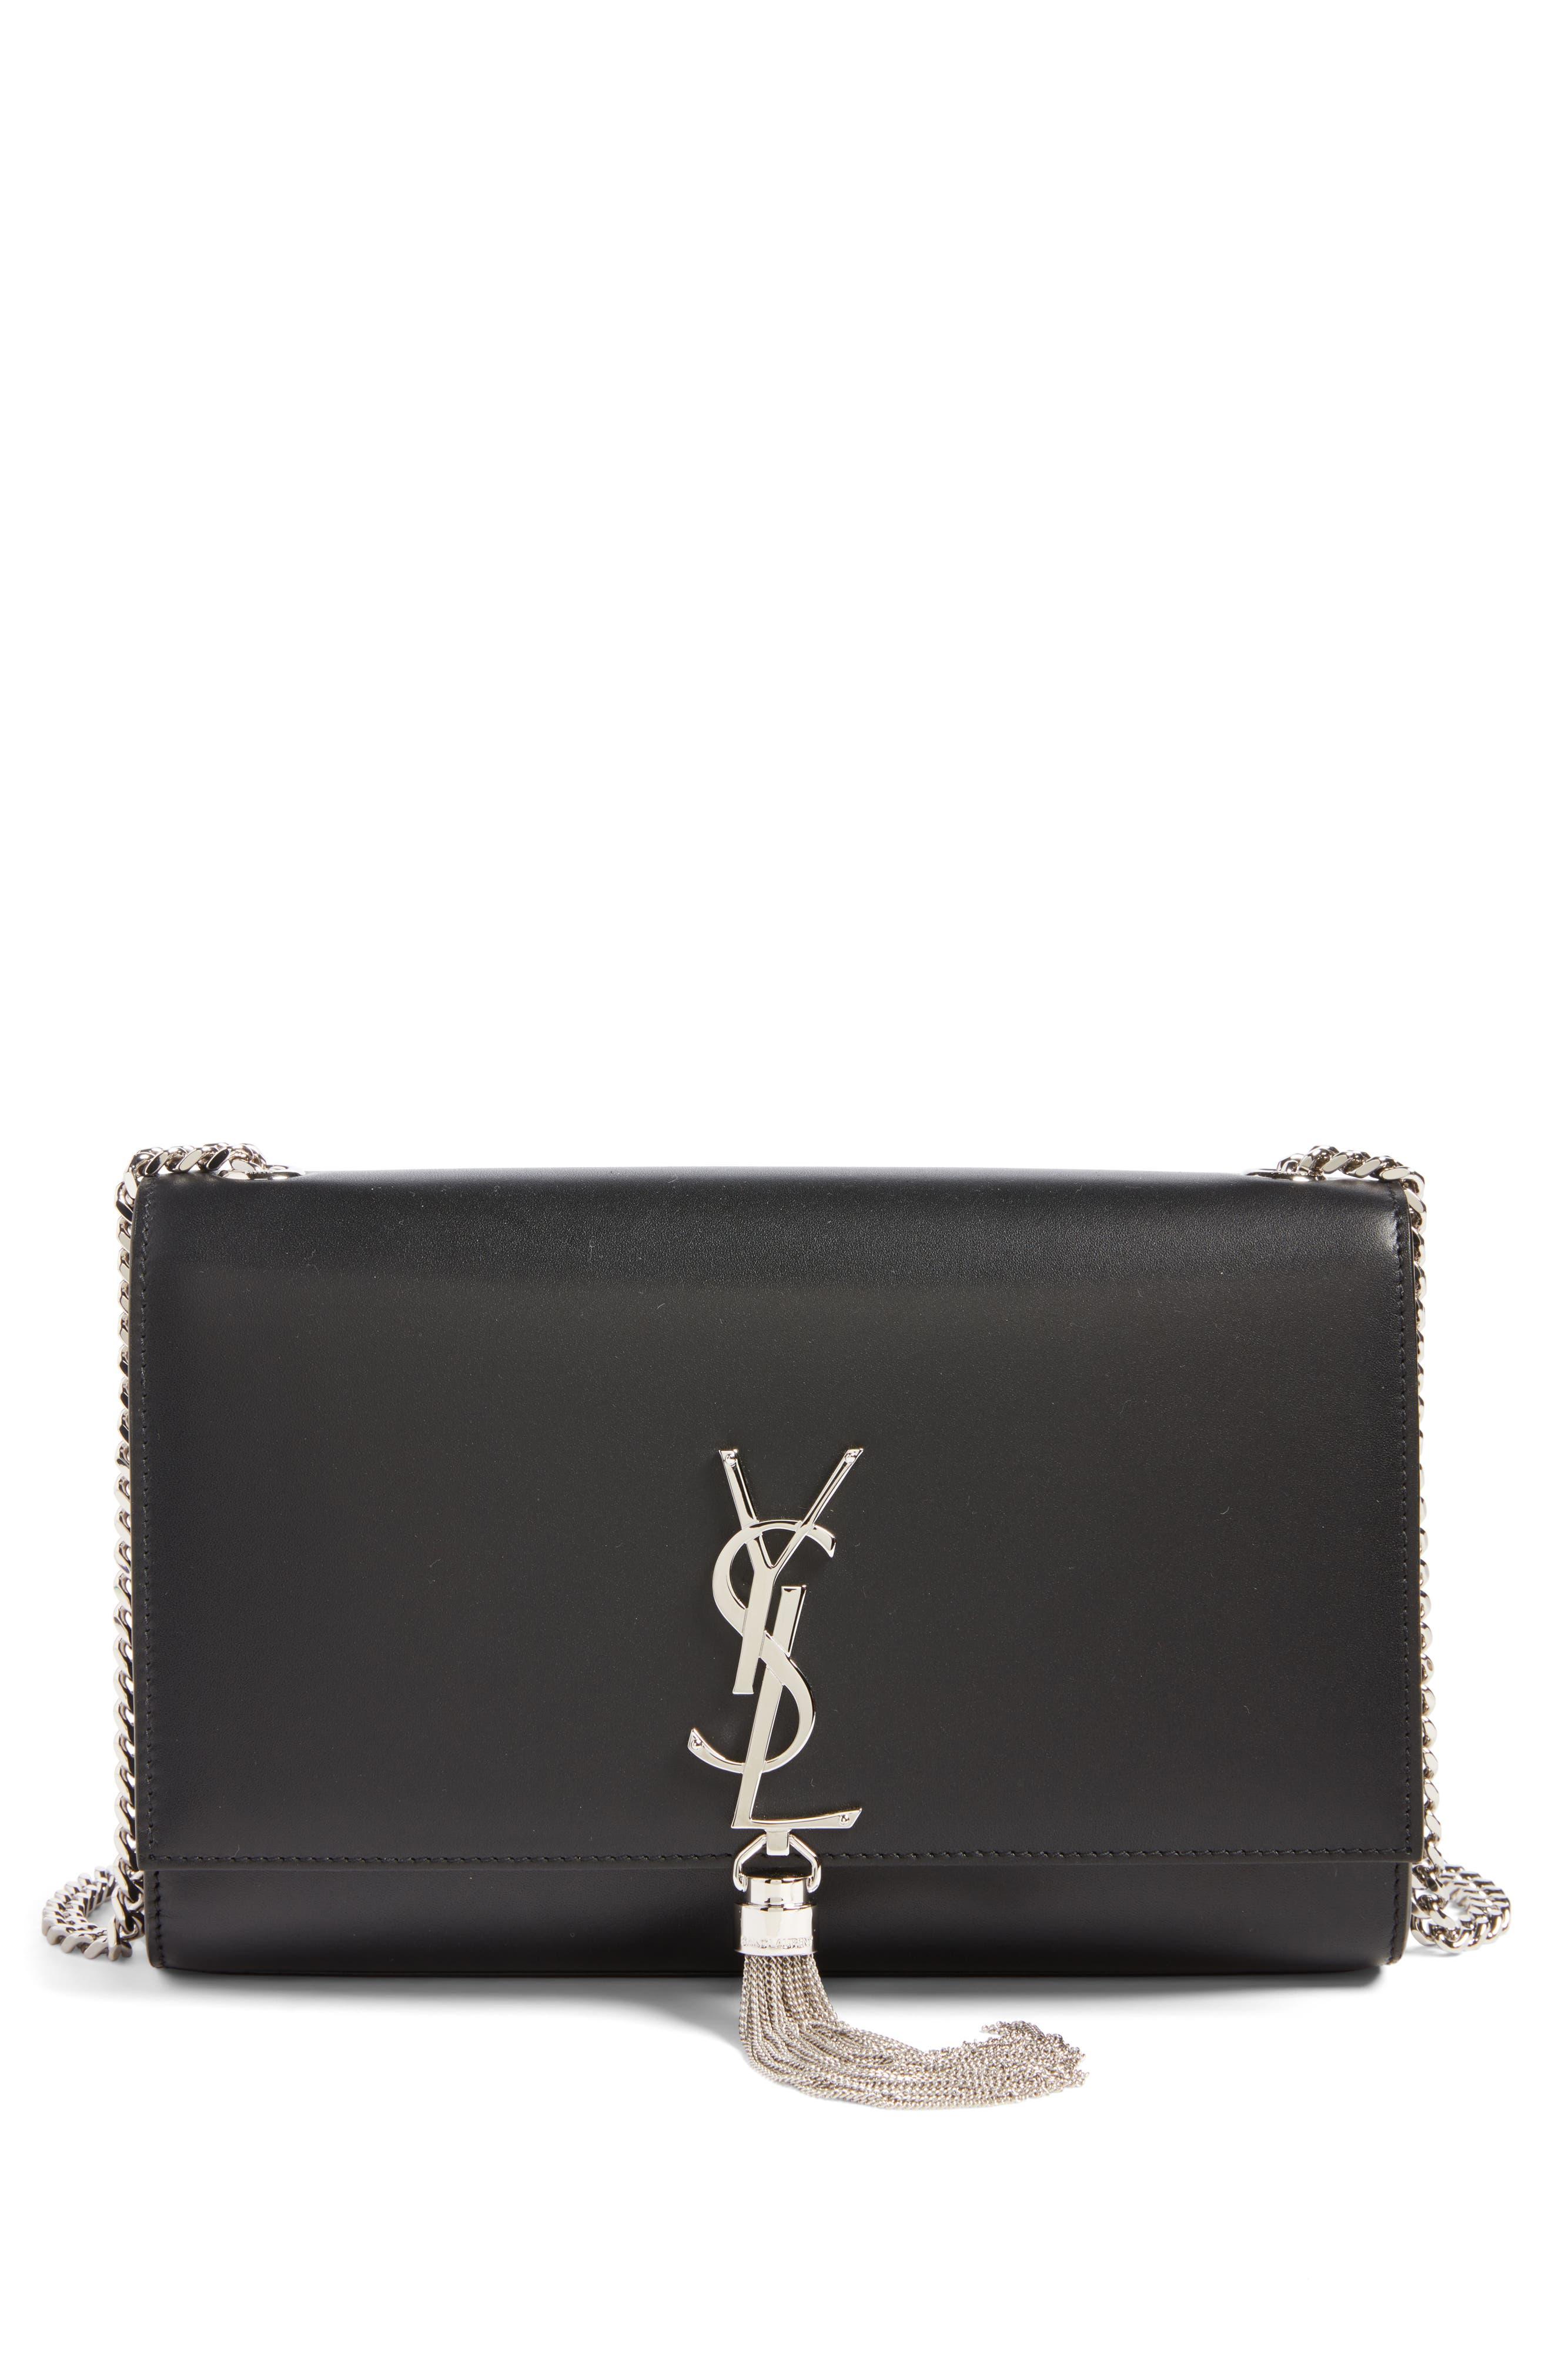 SAINT LAURENT Medium Kate - Tassel Calfskin Leather Crossbody Bag